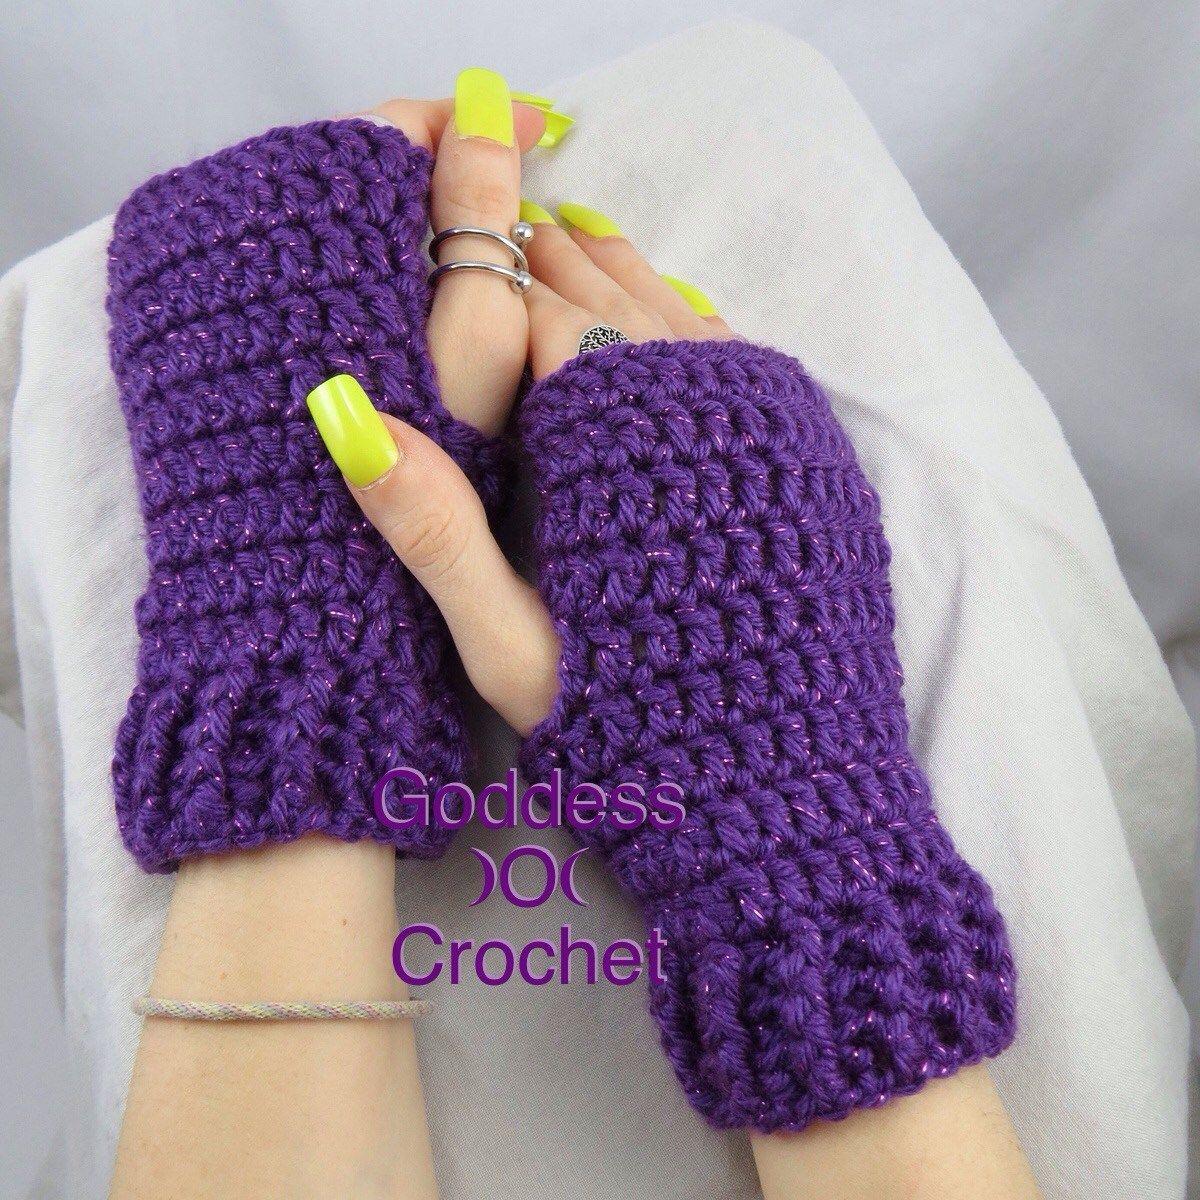 Goddess )O( Crochet | Crochet patterns | Pinterest